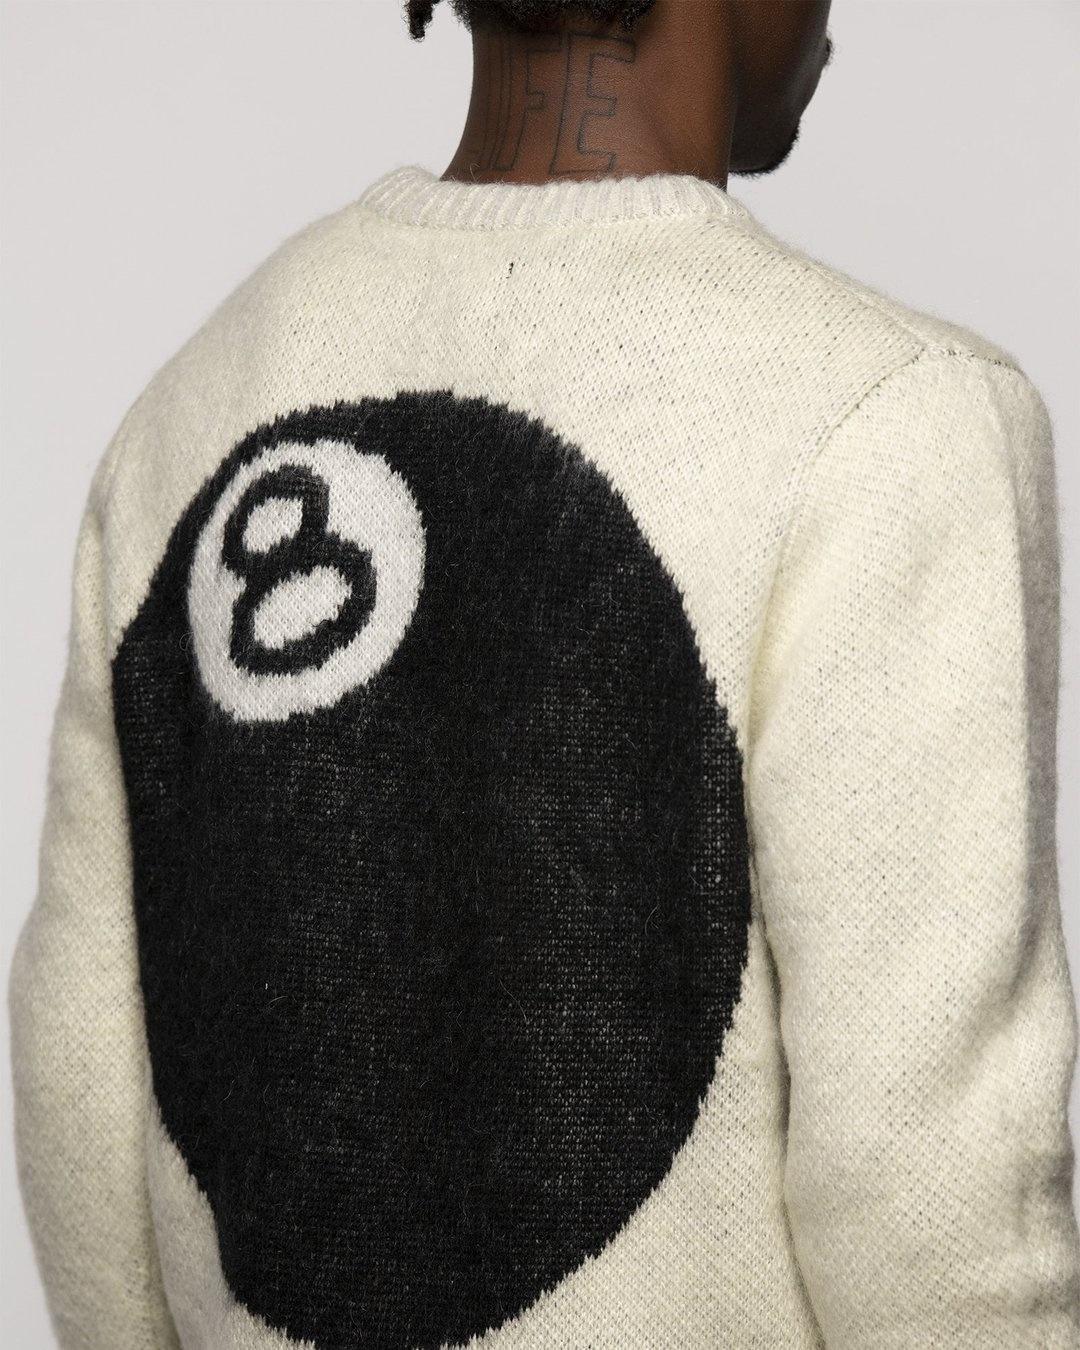 Stussy Stussy 8 Ball Mohair sweater Cream